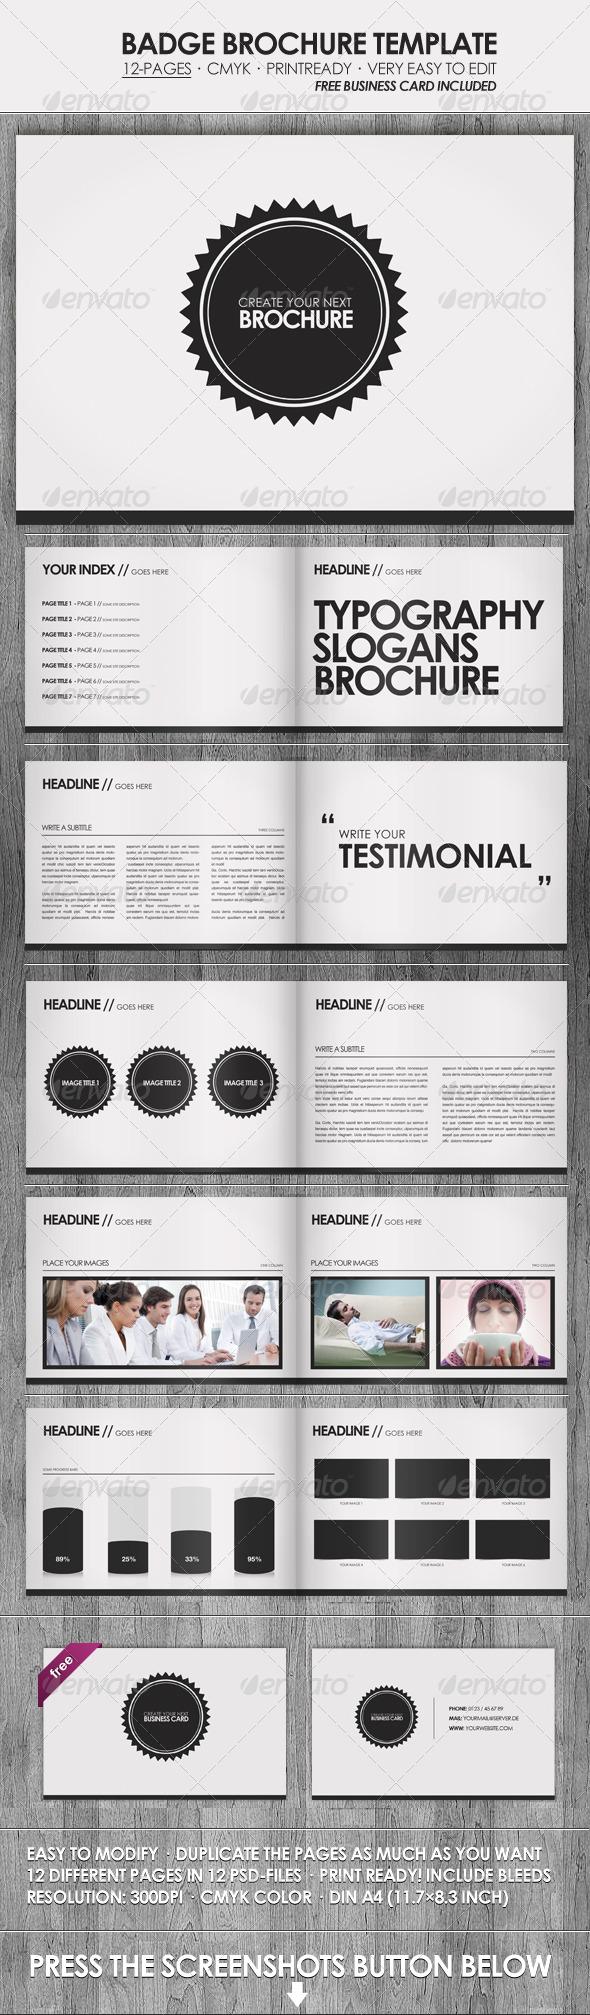 Badge - Brochure / Presentation Template - Corporate Brochures